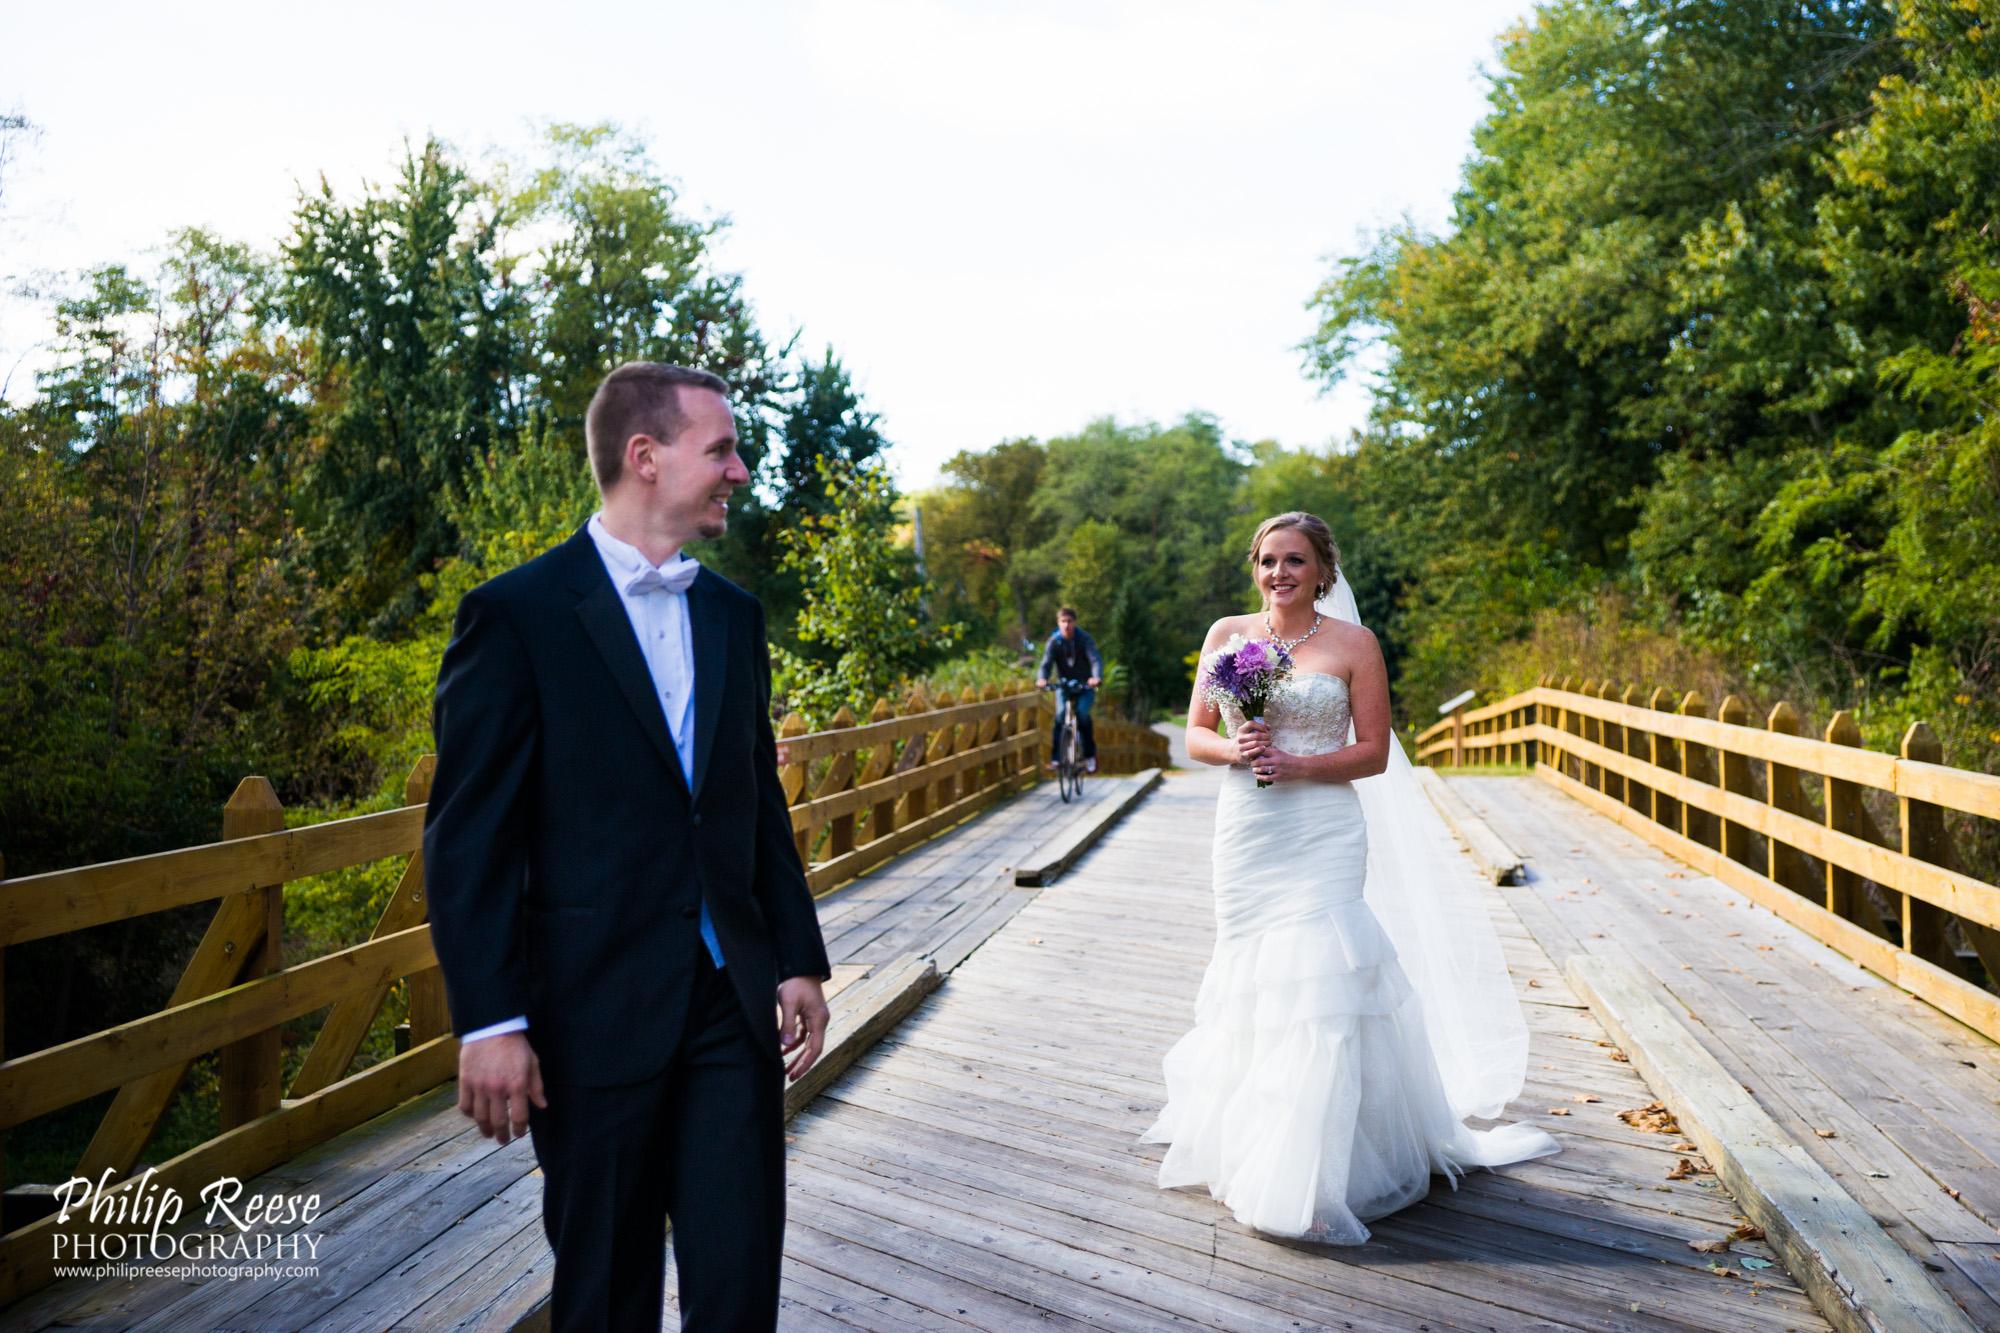 Bruder Wedding 009 - 05491.jpg